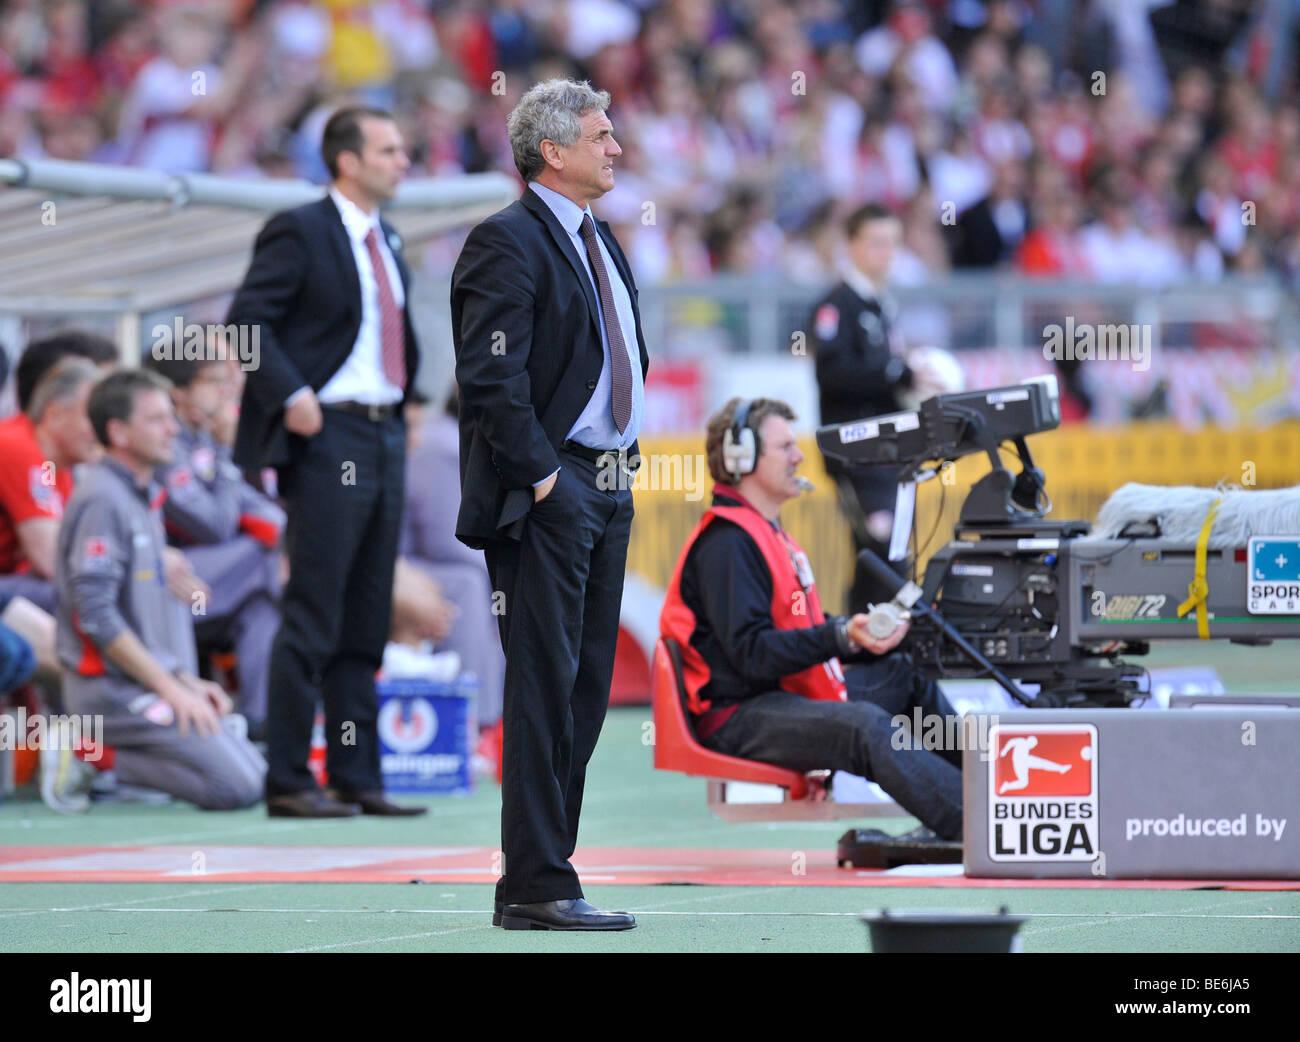 Coach Bojan PRASNIKAR, FC Energie Cottbus, in front of manager, coach Markus Babbel, VfB Stuttgart, at the sidelines, - Stock Image